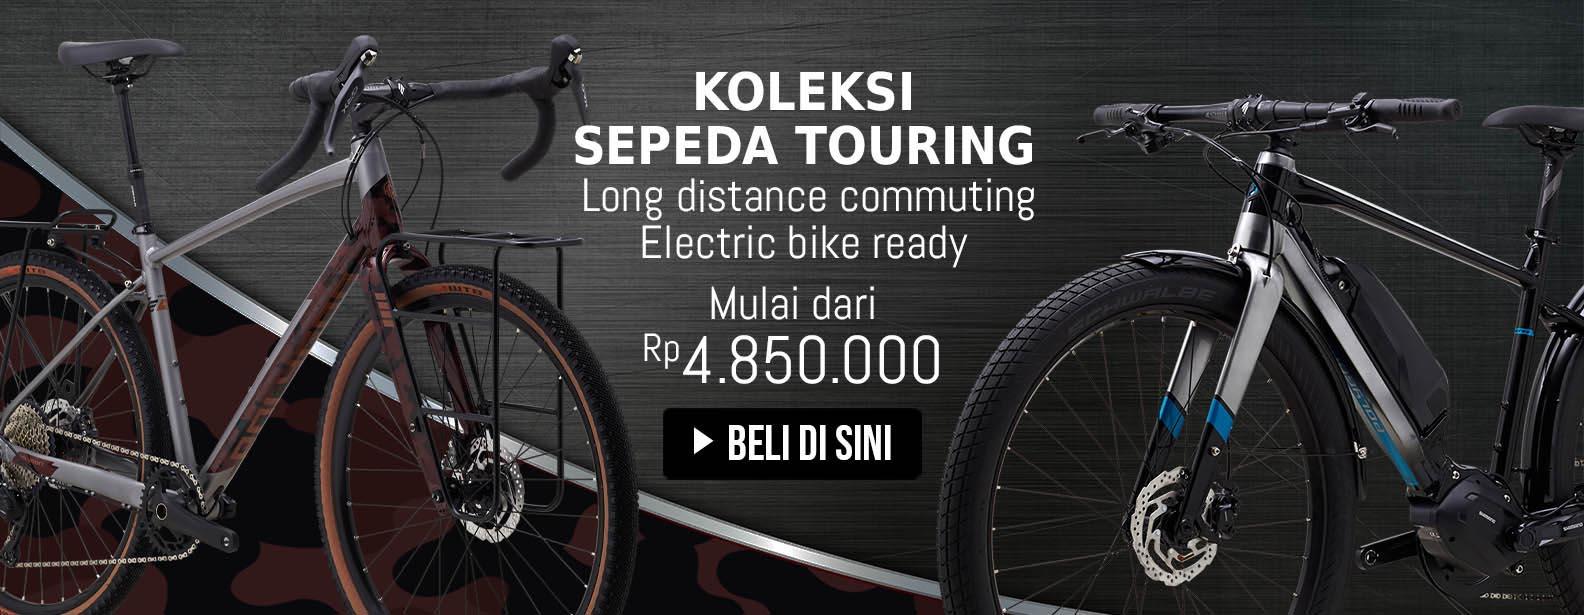 Koleksi Sepeda Touring